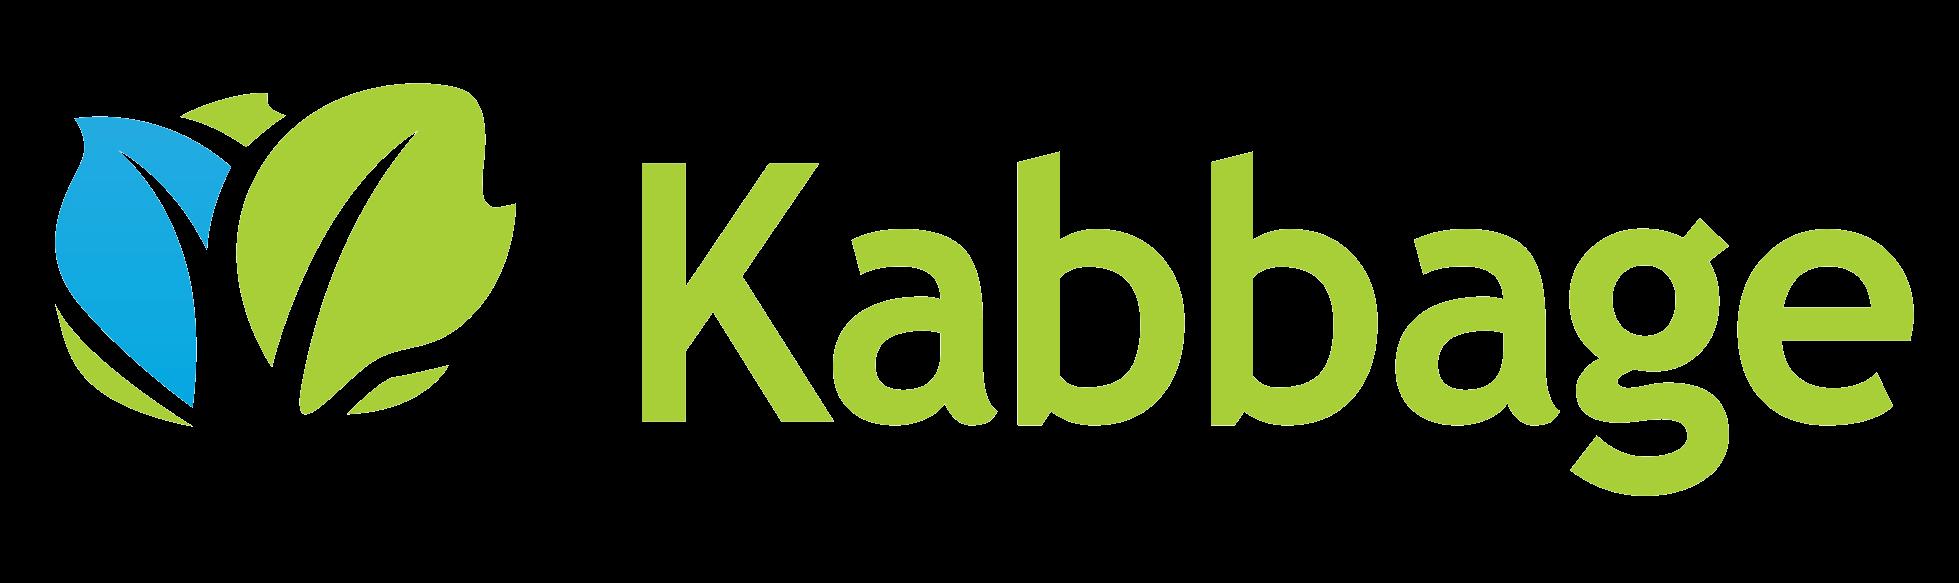 Kabbage-newlogo-001